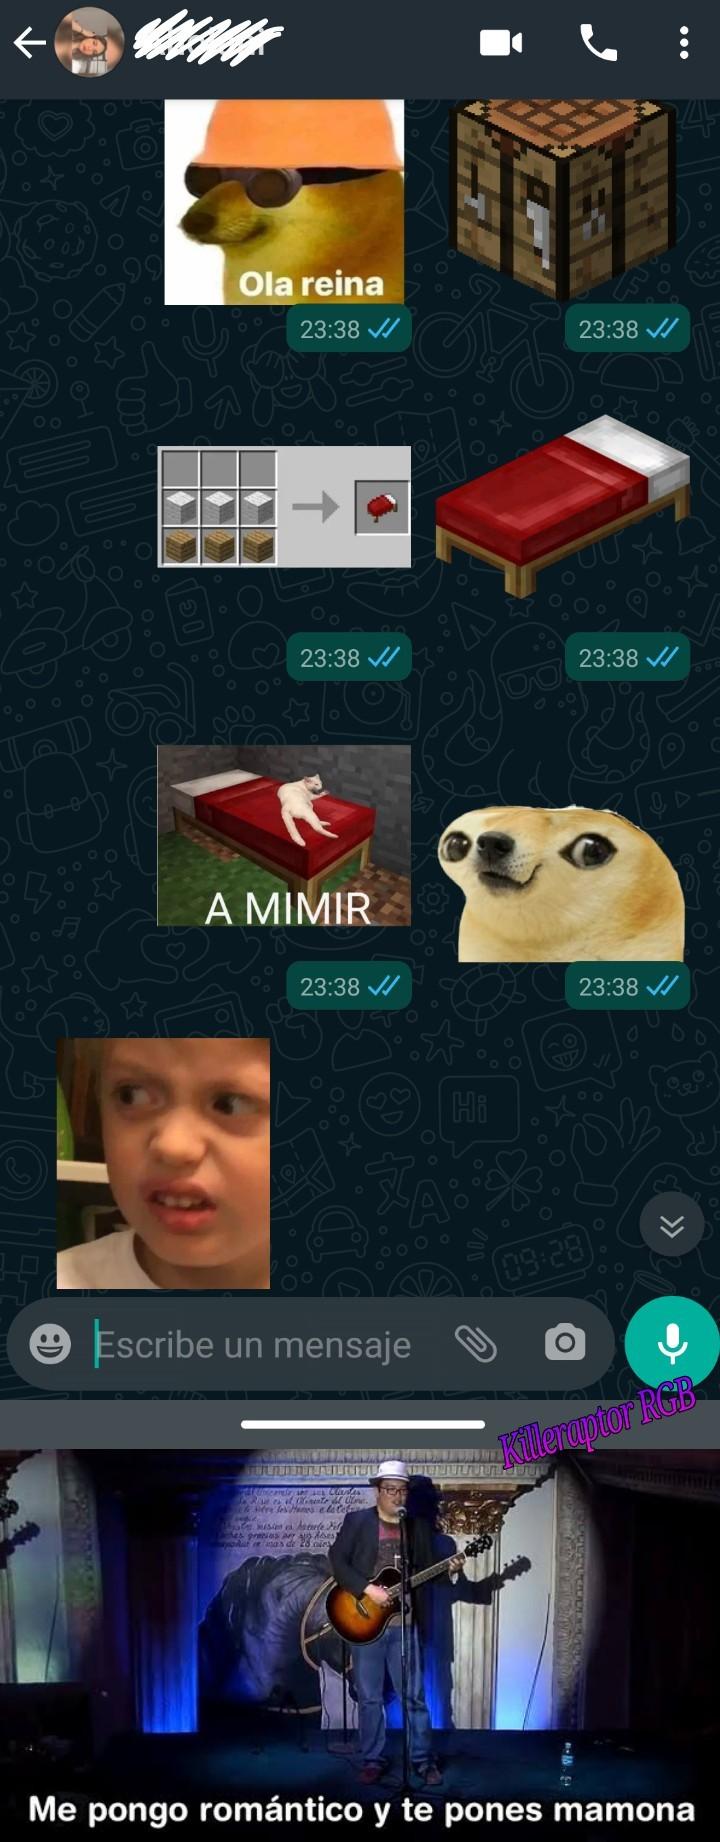 A mimir :D - meme